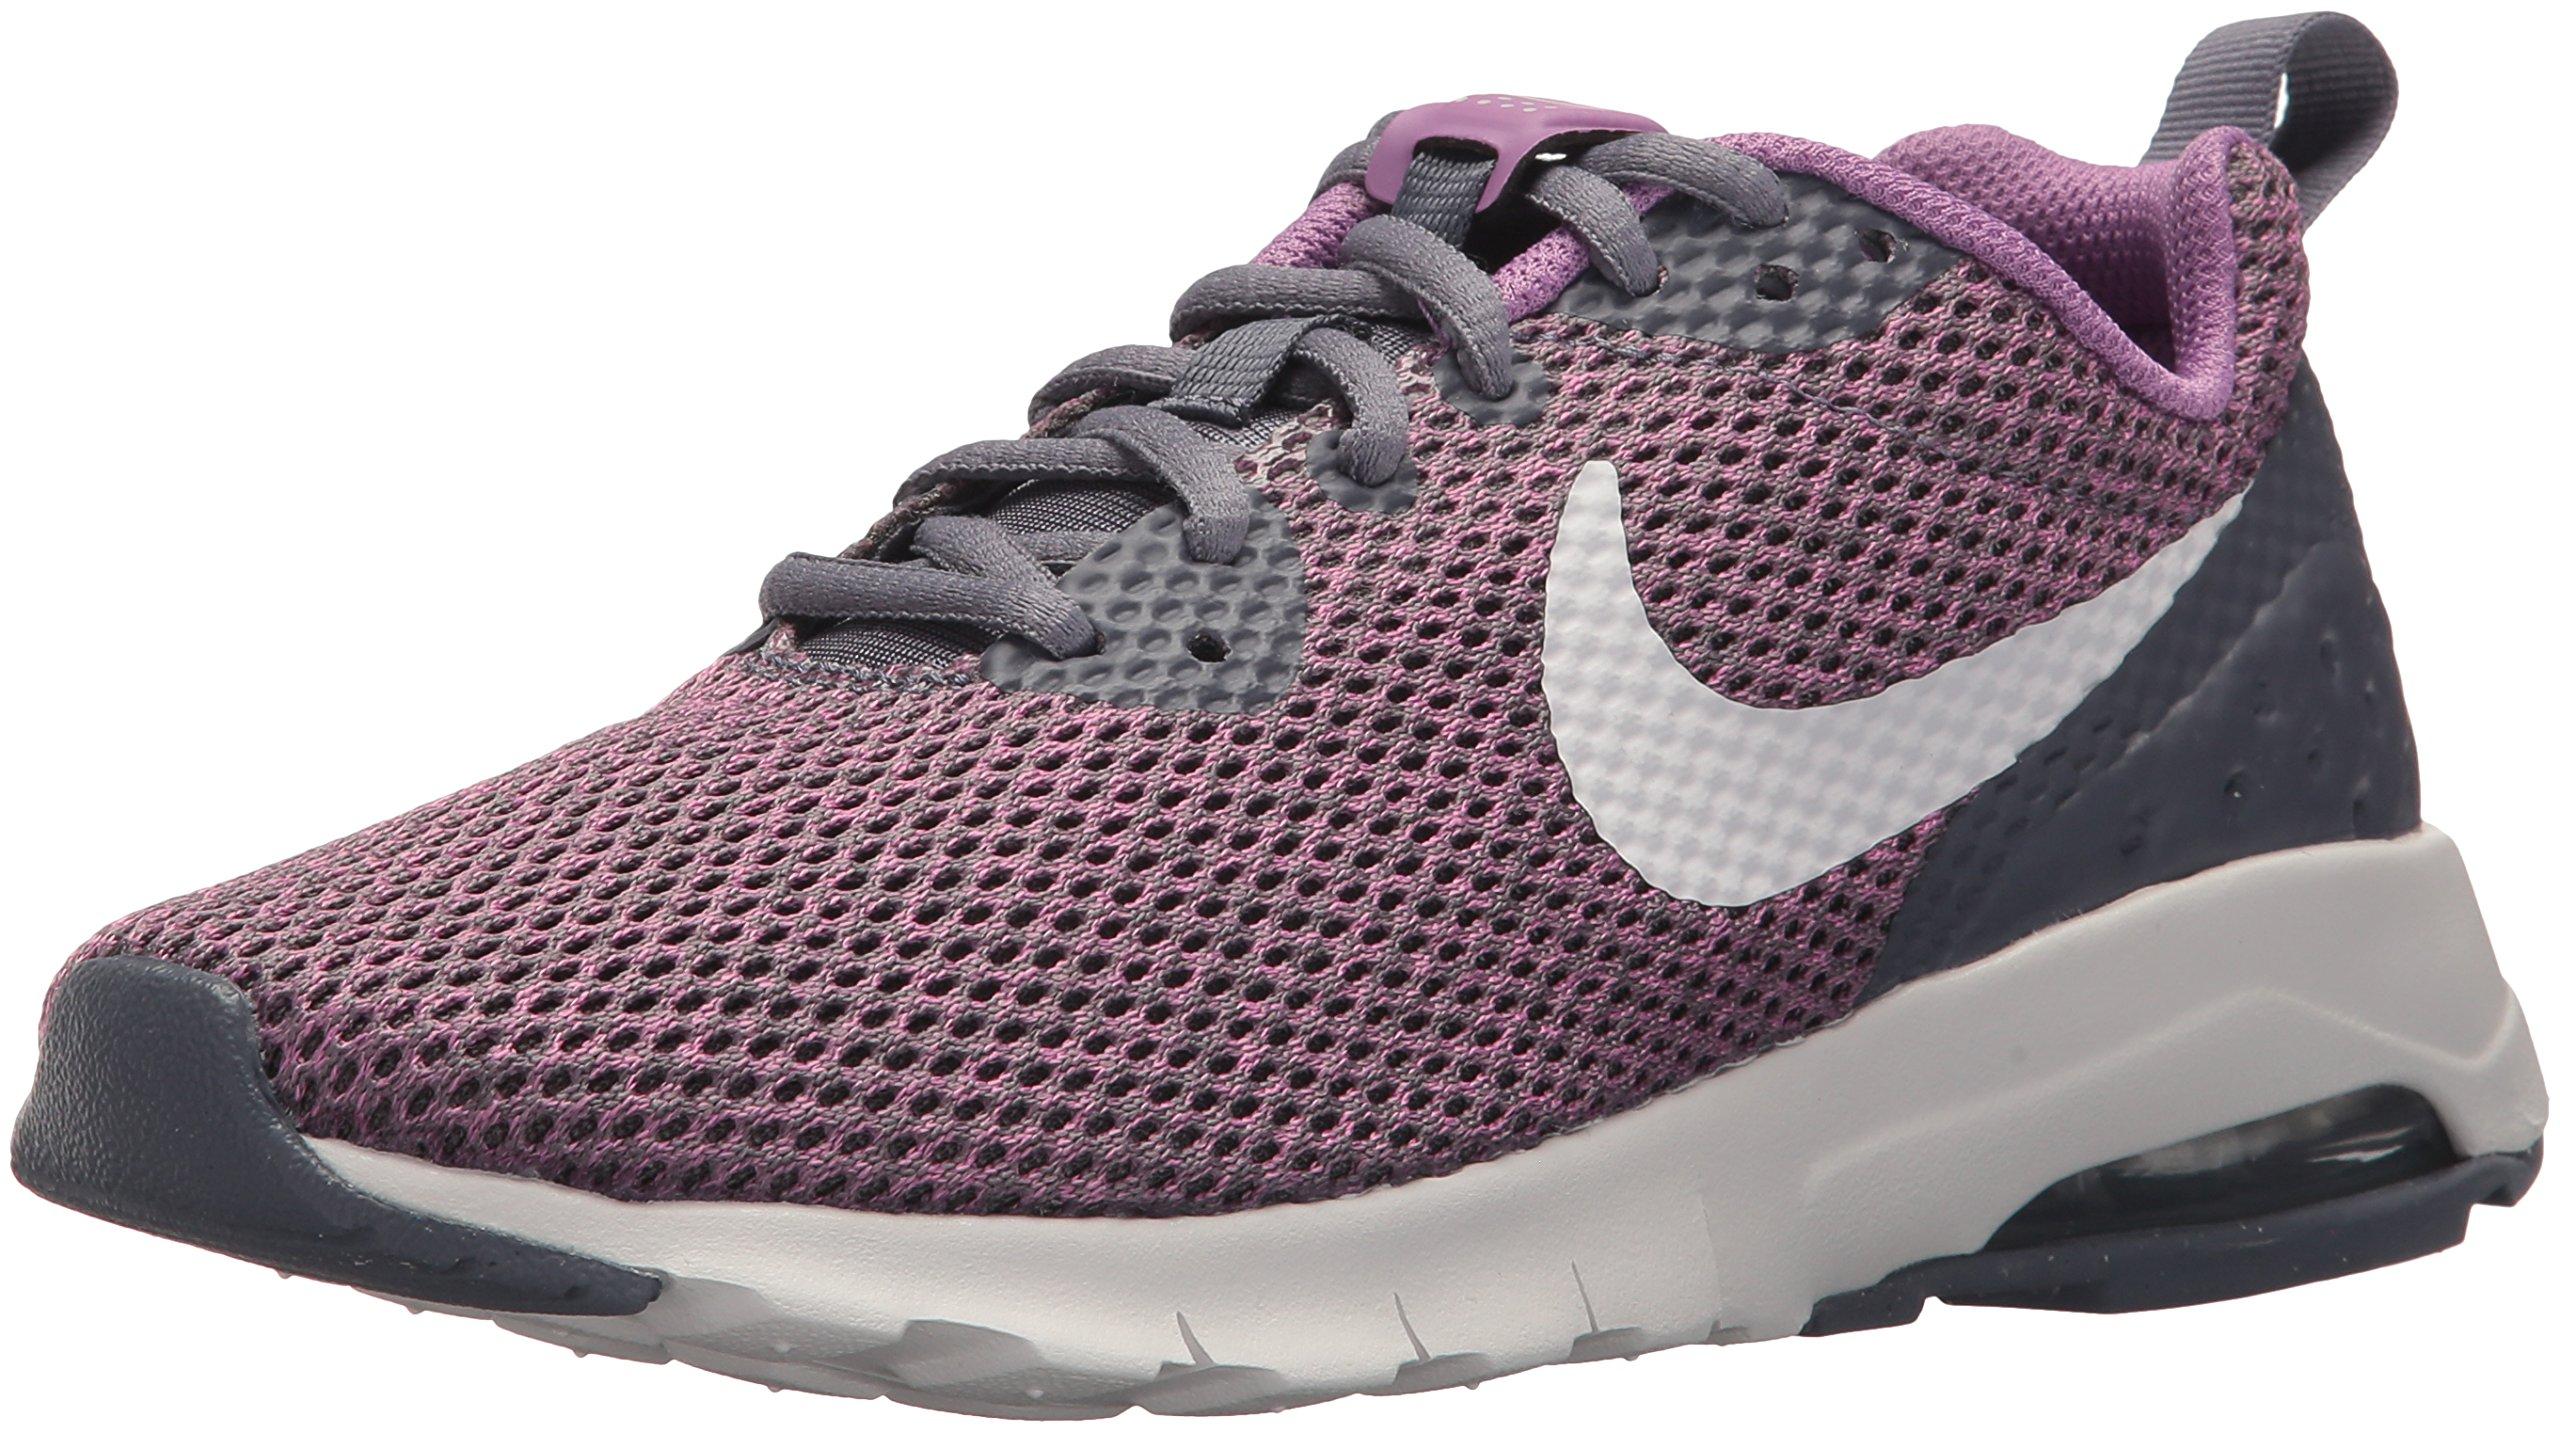 Nike NIKE Women's Air Max Motion LW Running Shoe, Pure PlatinumWhite, 9.5 B(M) US from Amazon ShapeShop  ShapeShop